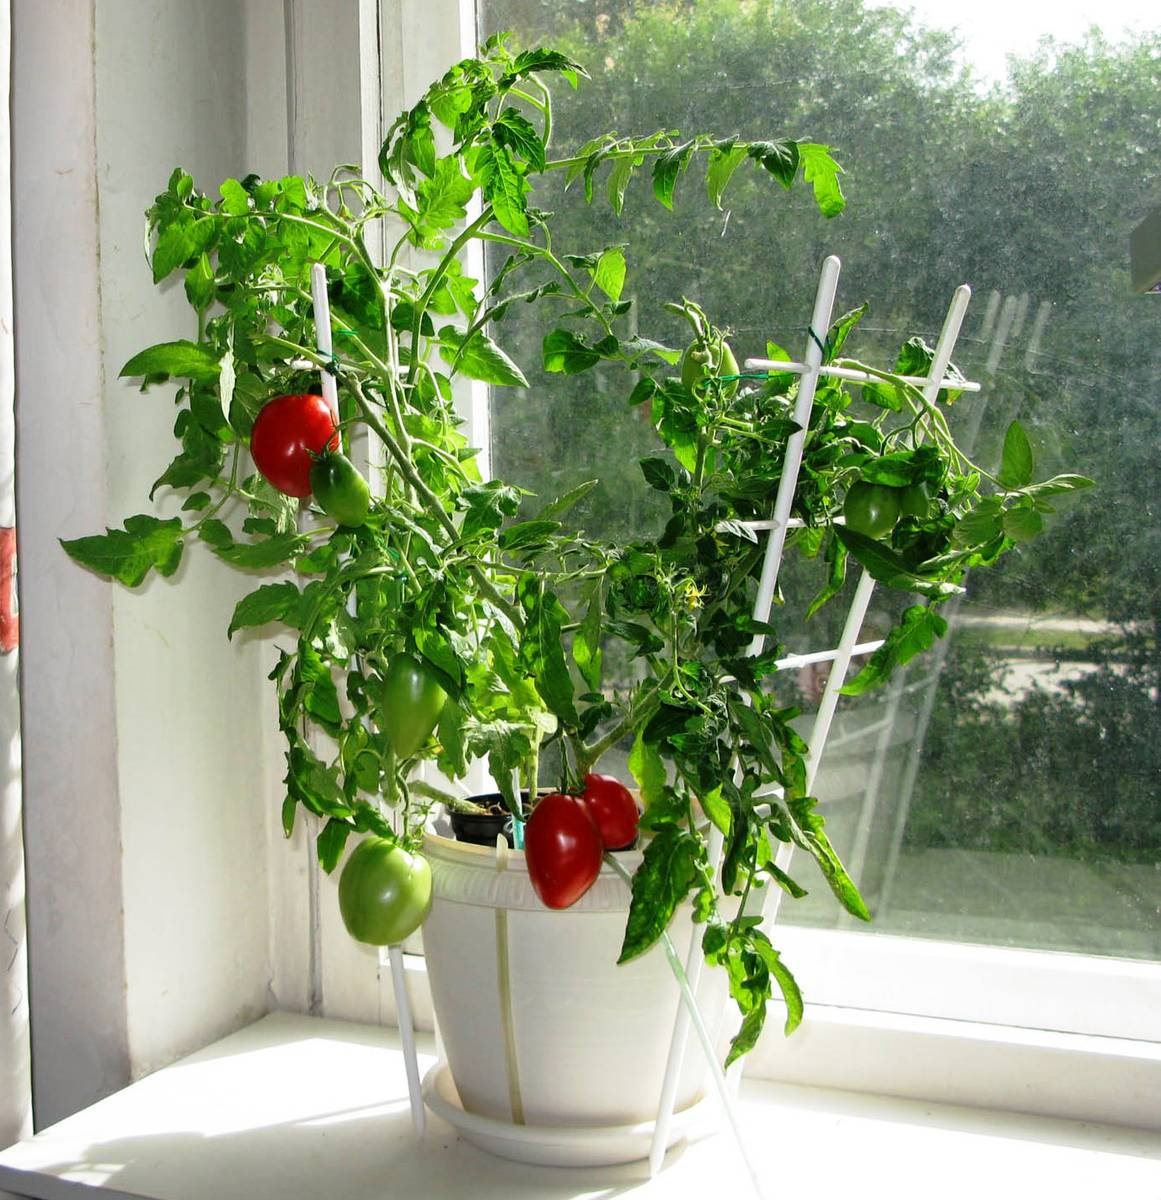 Помидоры черри на подоконнике выращивание и уход, фото и видео